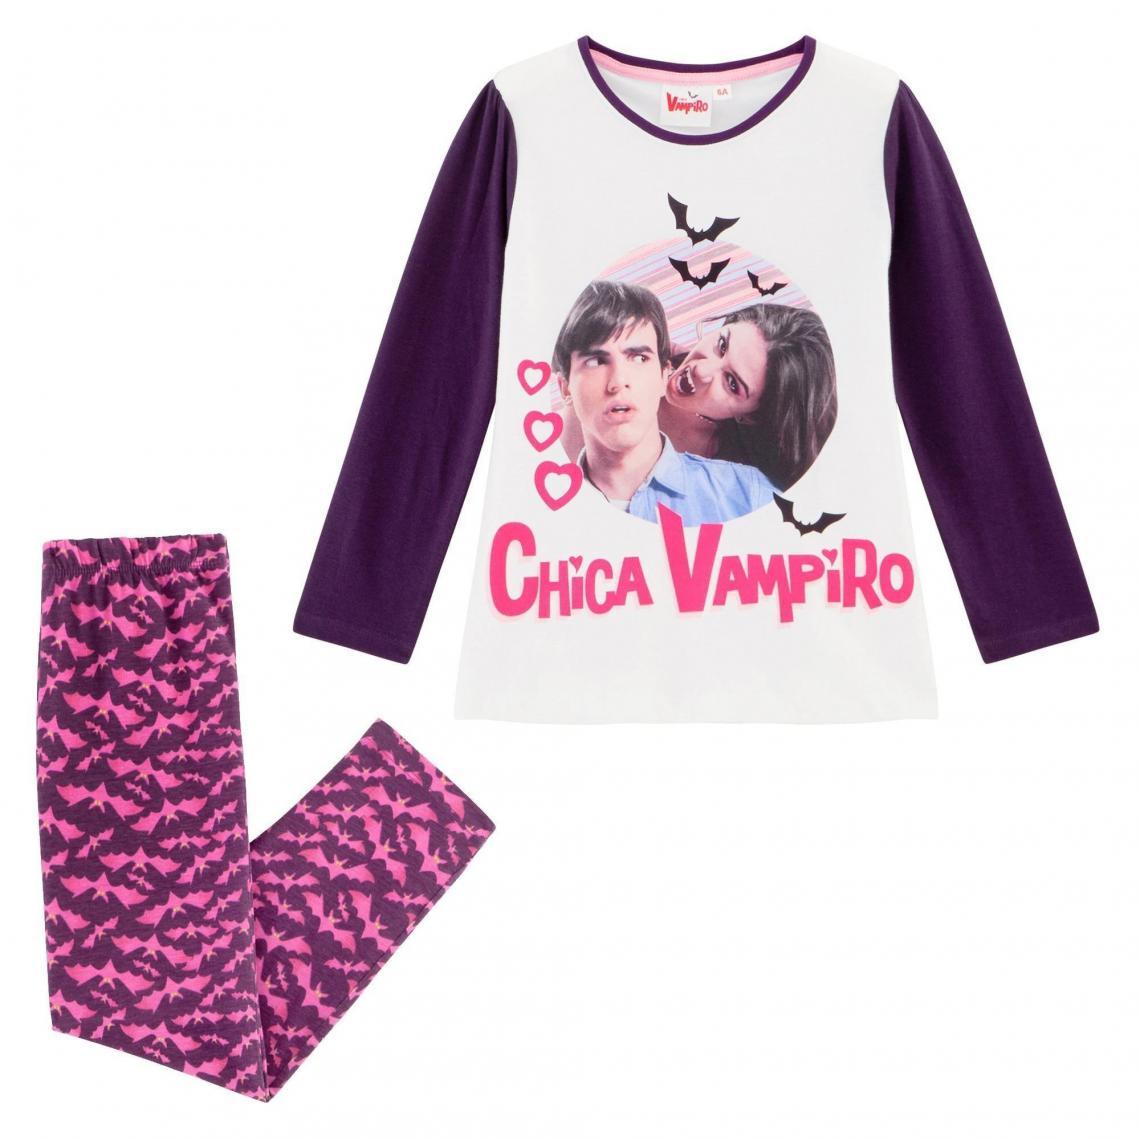 a1122f3ff1bb0 Pyjama fille imprimé Chica Vampiro - Violet Chica Vampiro Enfant